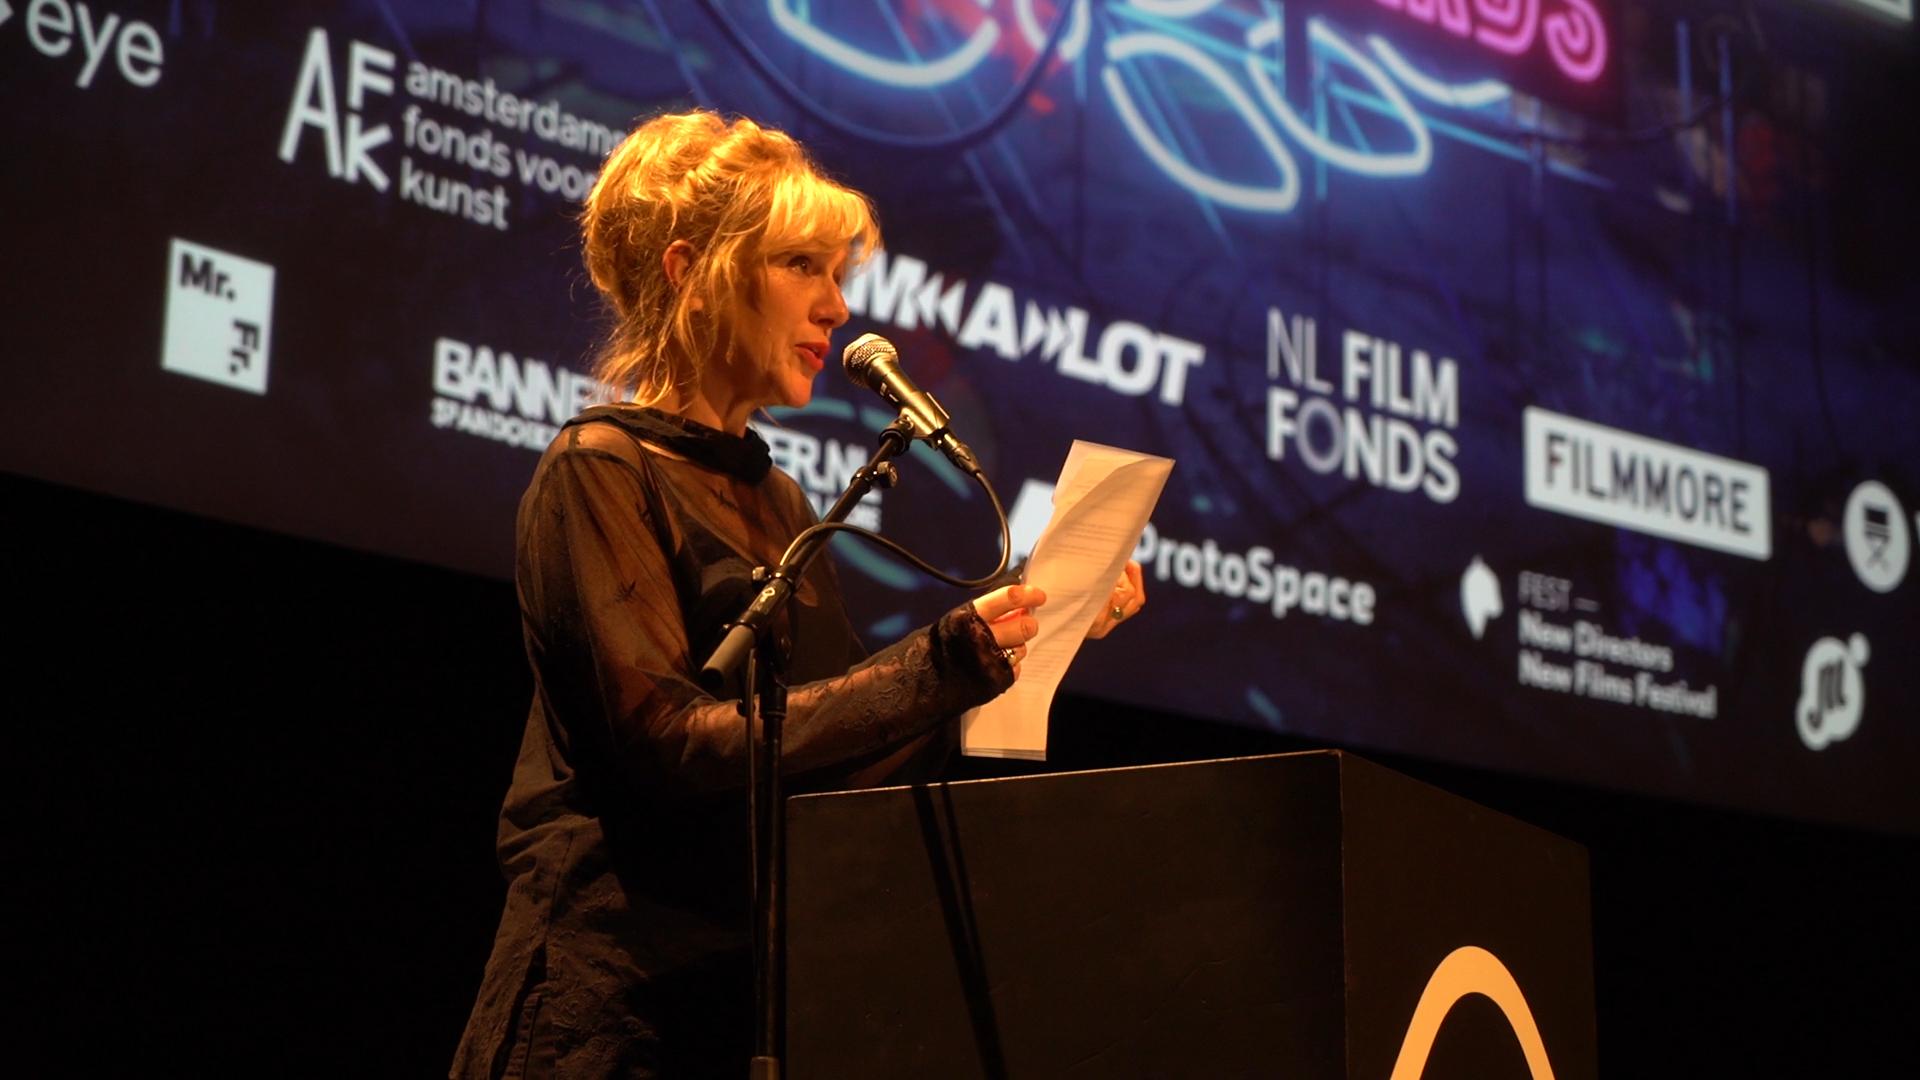 actress Johanna ter Steege |Photo credits: Magda Lepczyńska